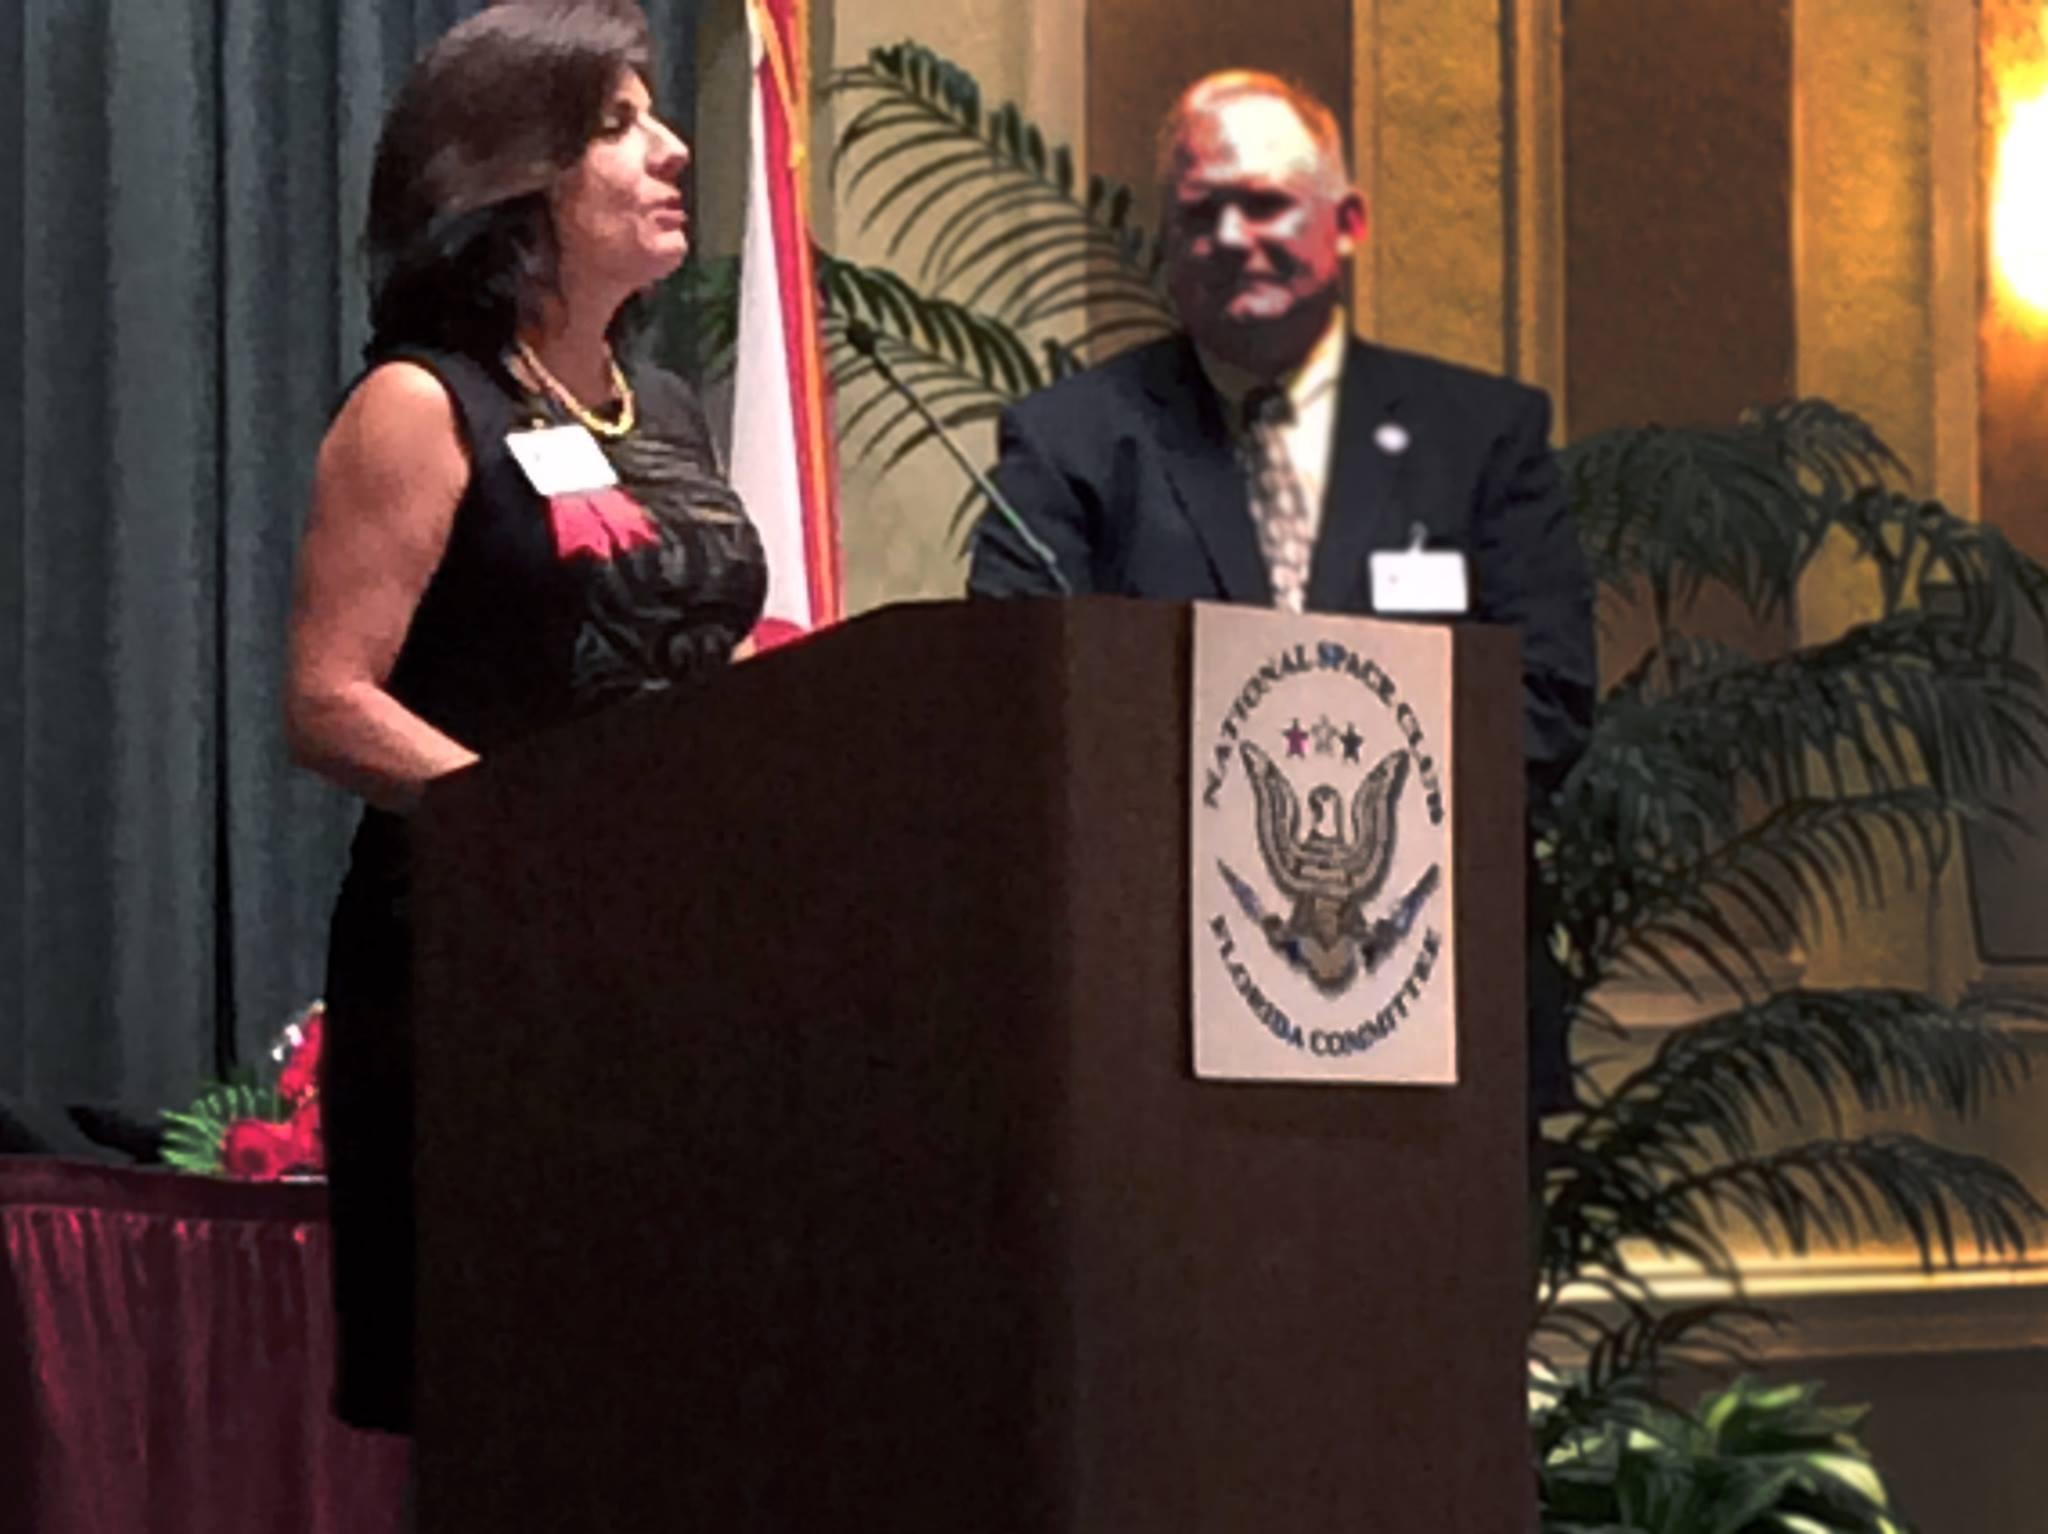 FPRA Member, Andrea Farmer, Receives 2013 Harry Kolcum Communications & News Award